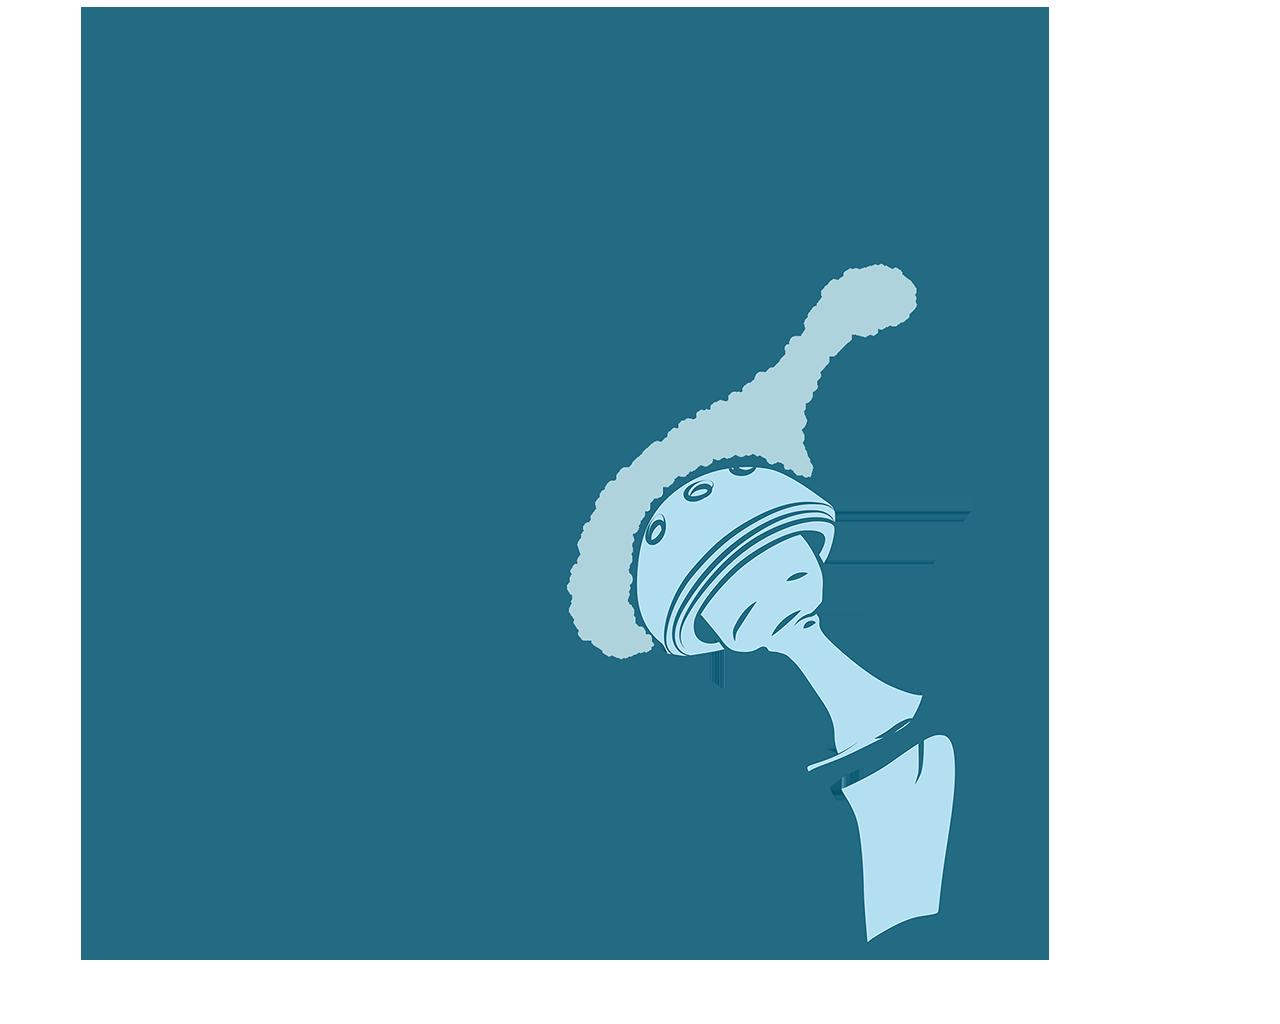 endoproteza biodra jak wyglada